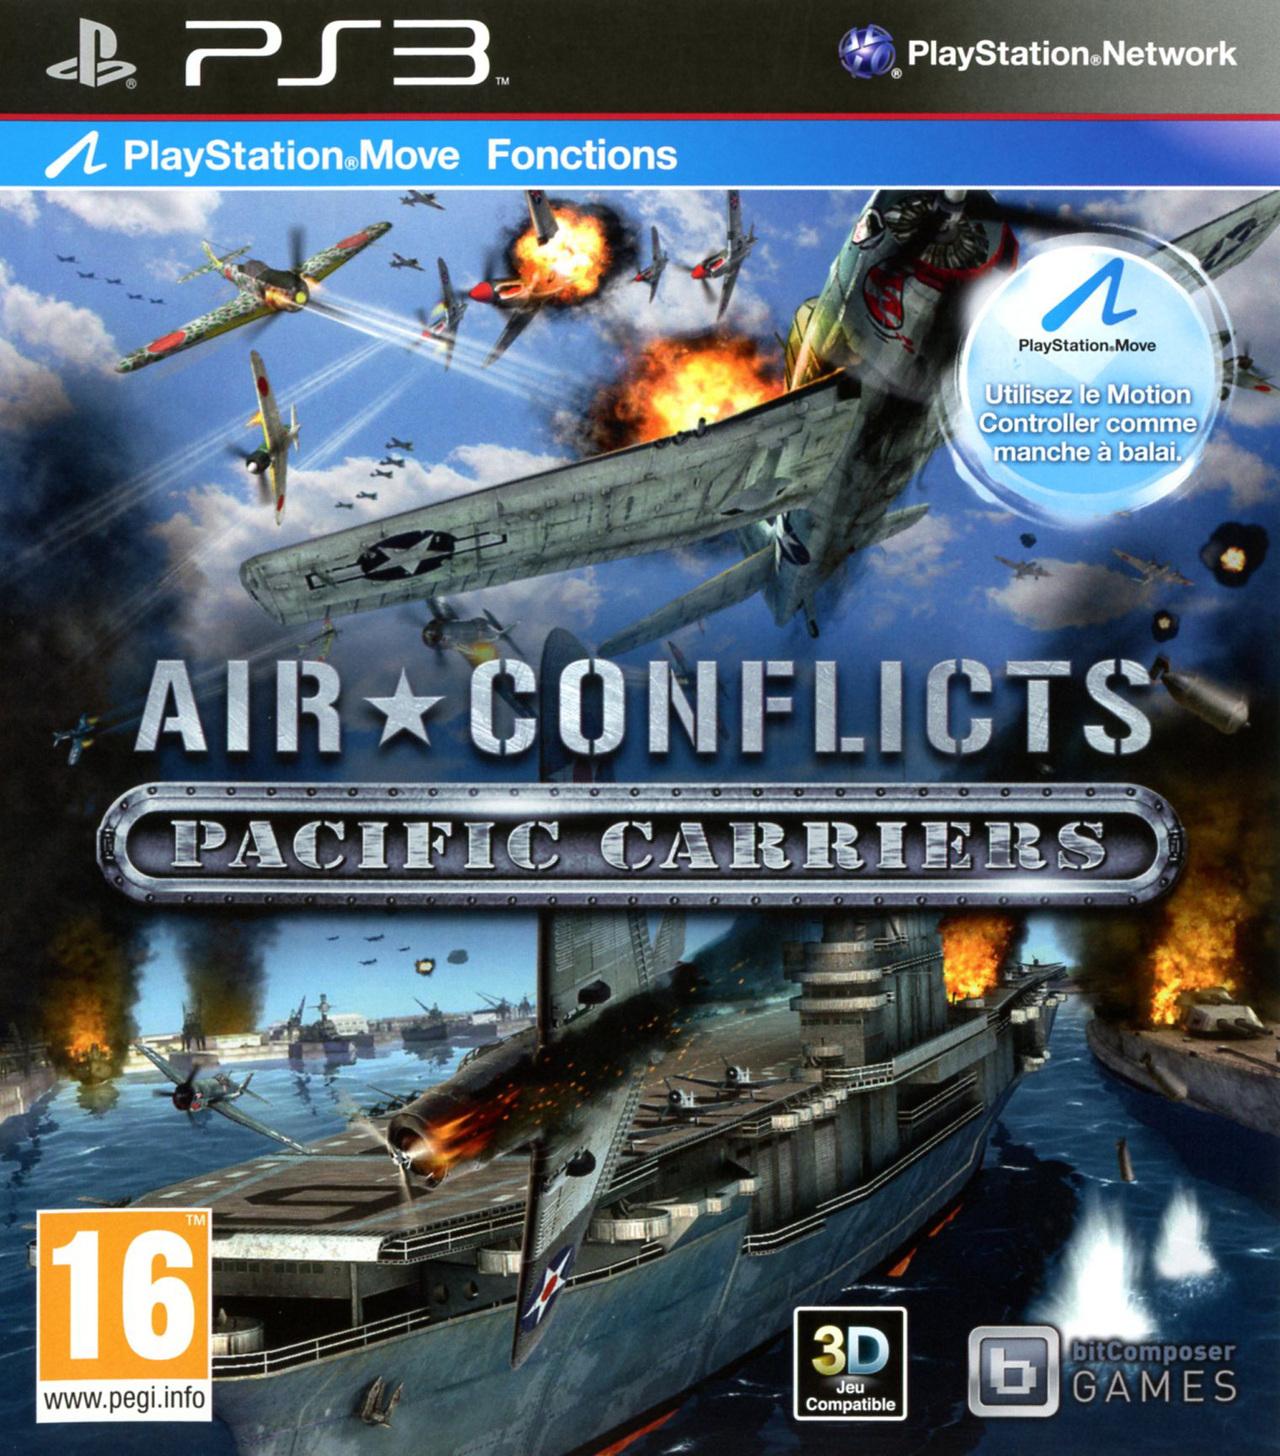 Playstation 3 flying games